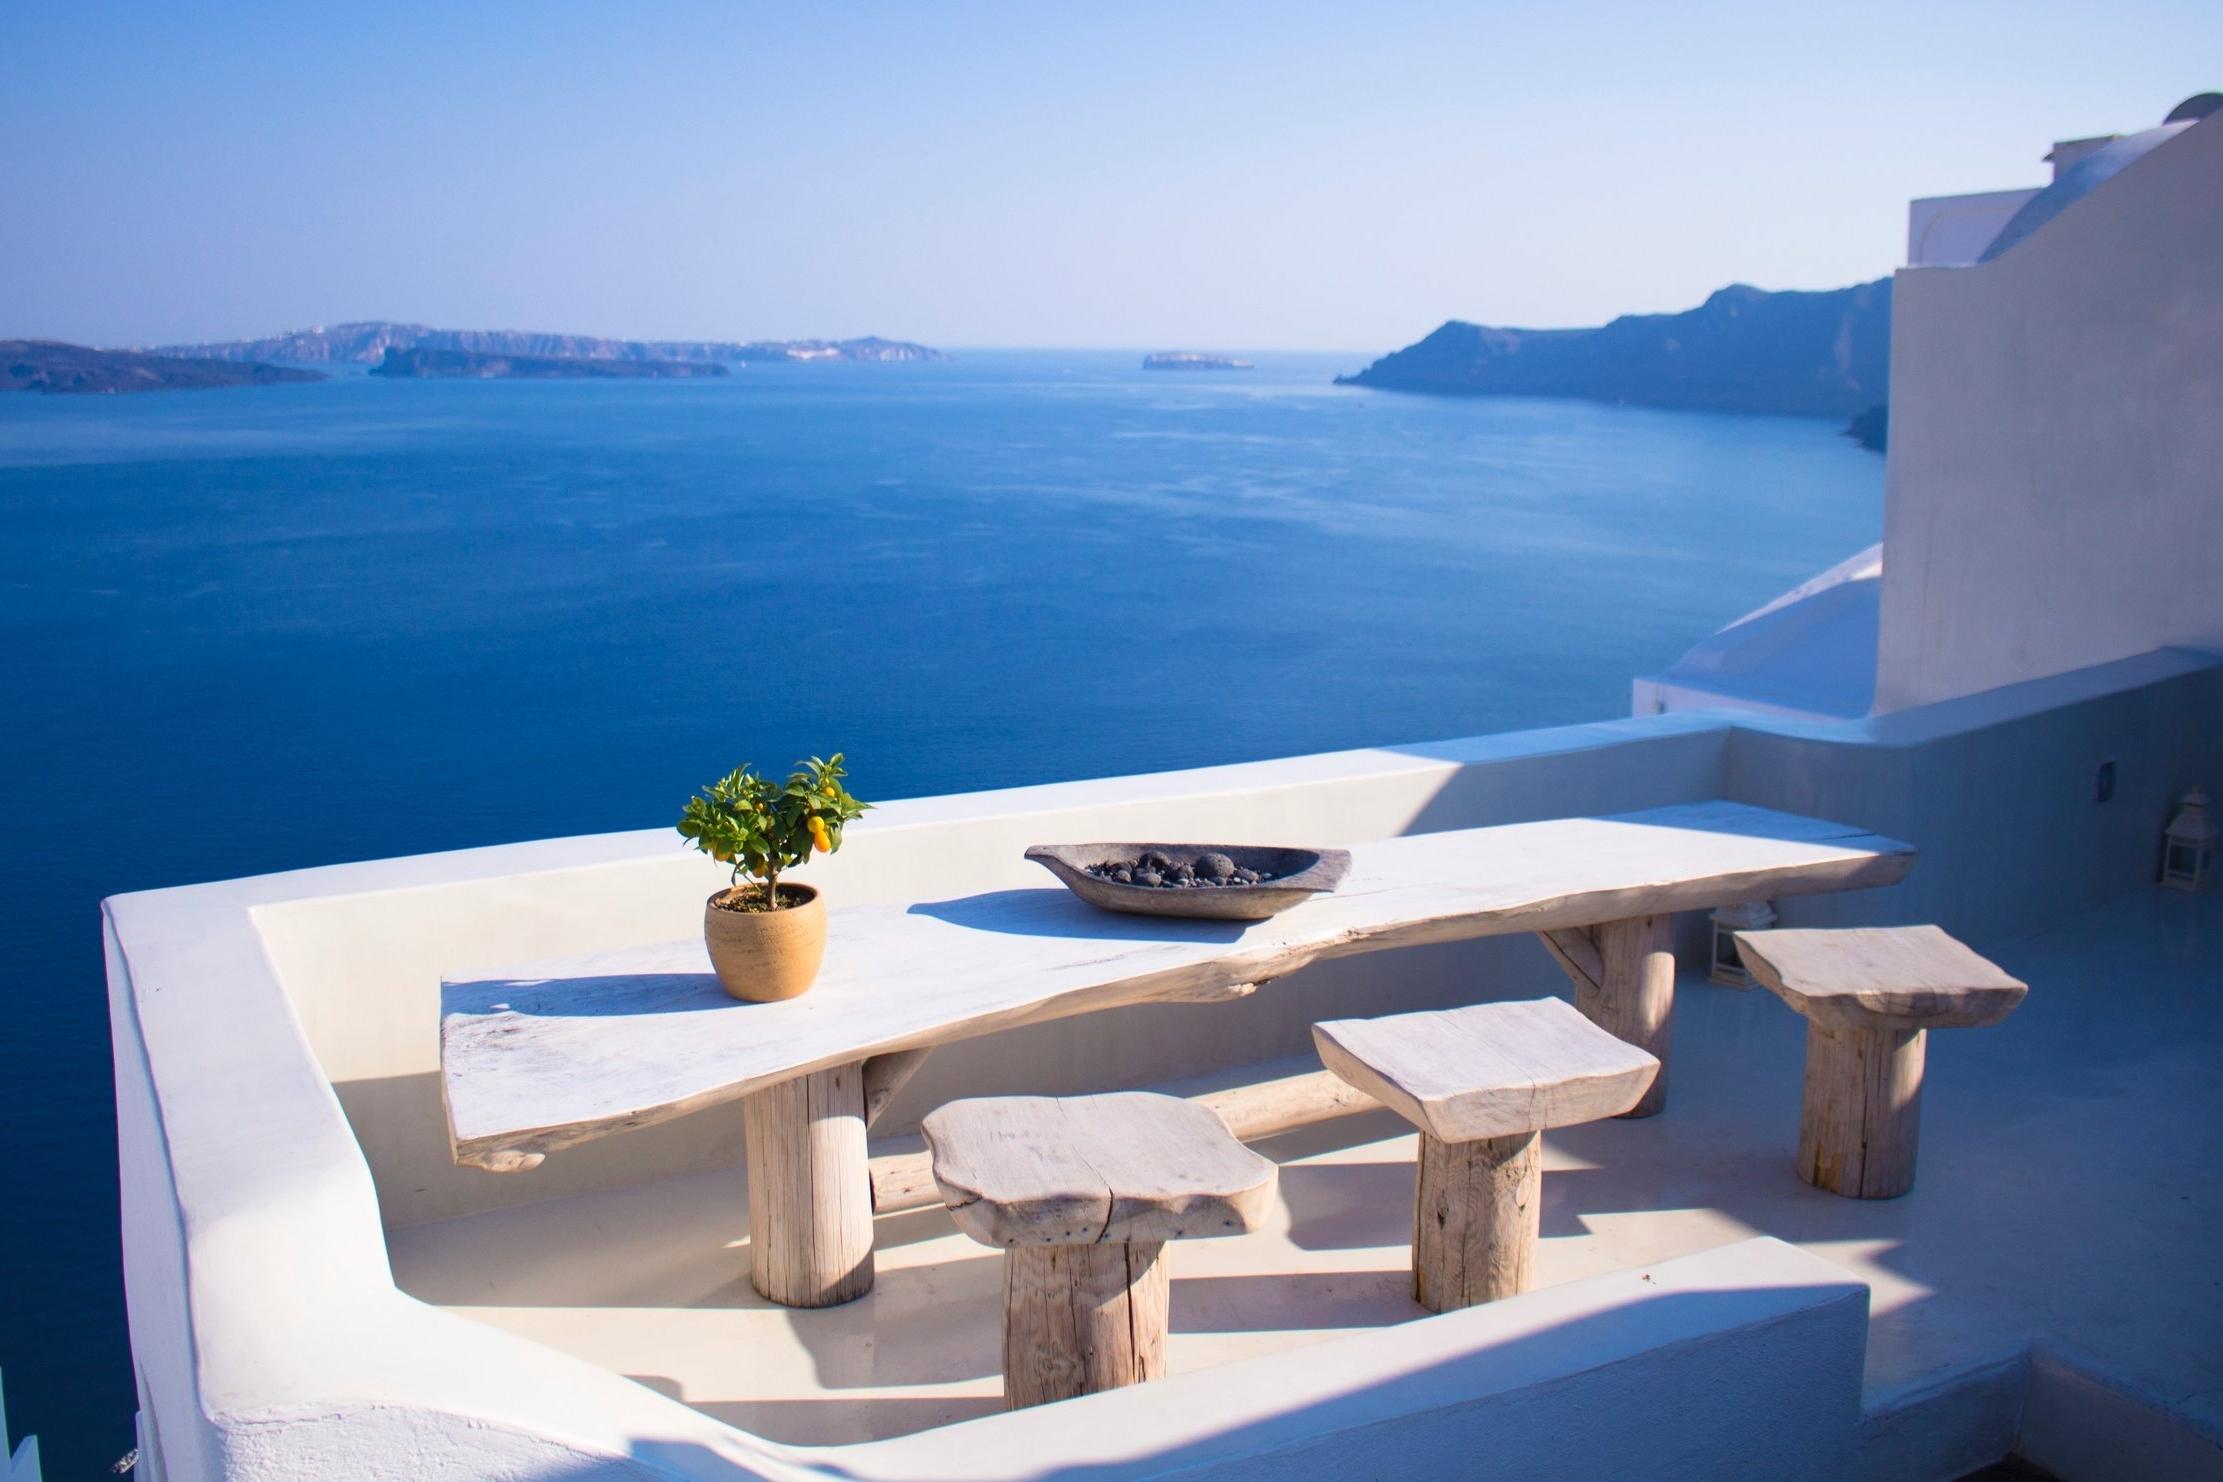 Retreats in the Mediterranean